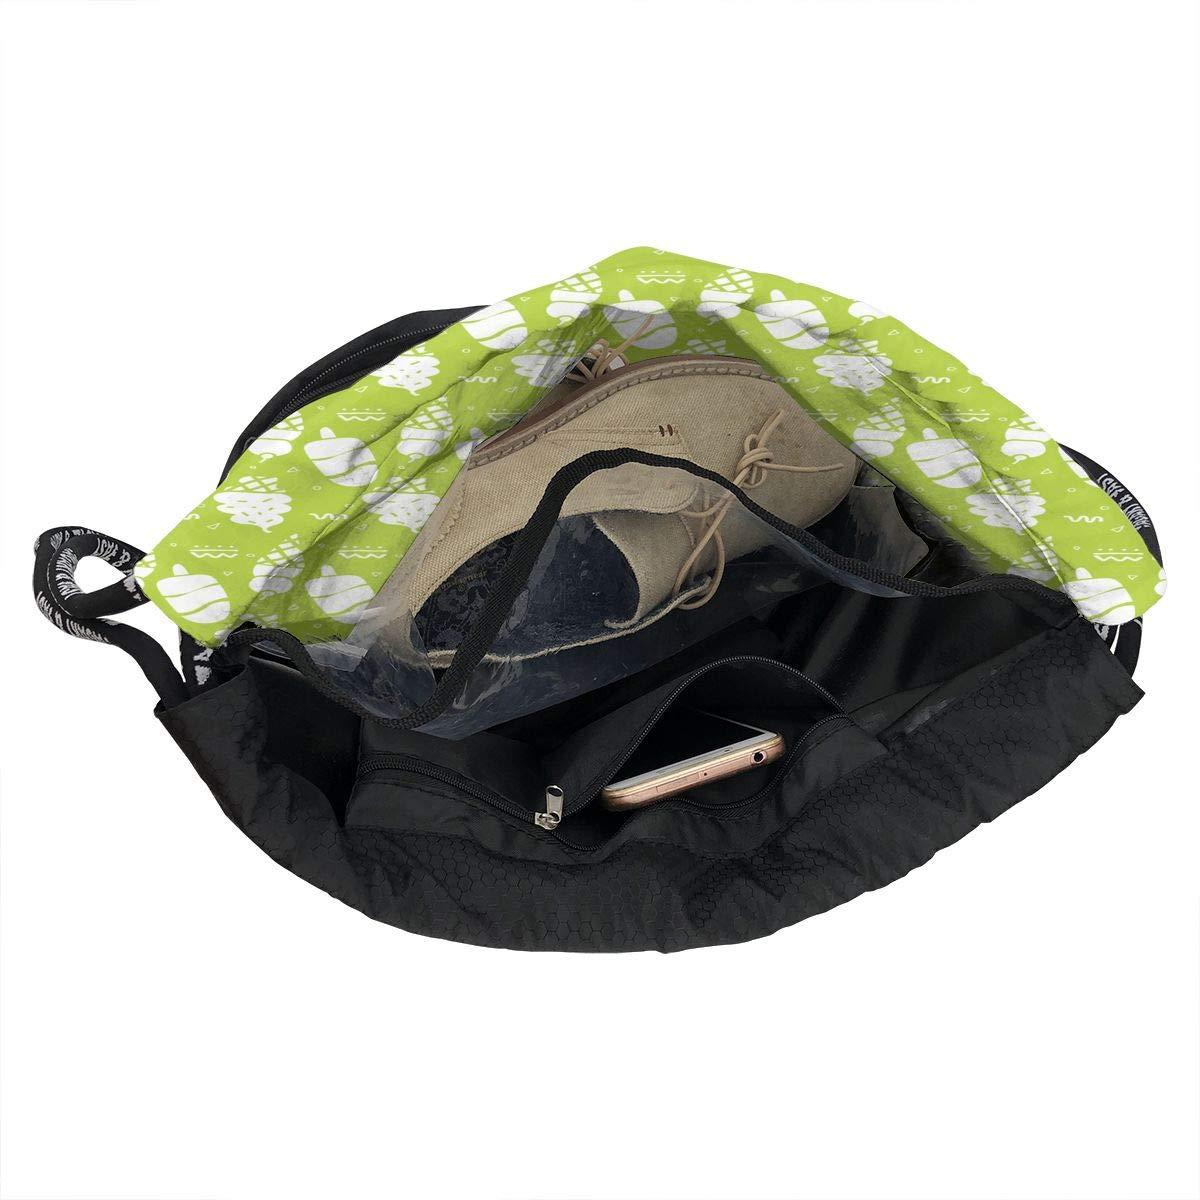 HUOPR5Q Yellow Colorful Cute Funny Pineapple Drawstring Backpack Sport Gym Sack Shoulder Bulk Bag Dance Bag for School Travel